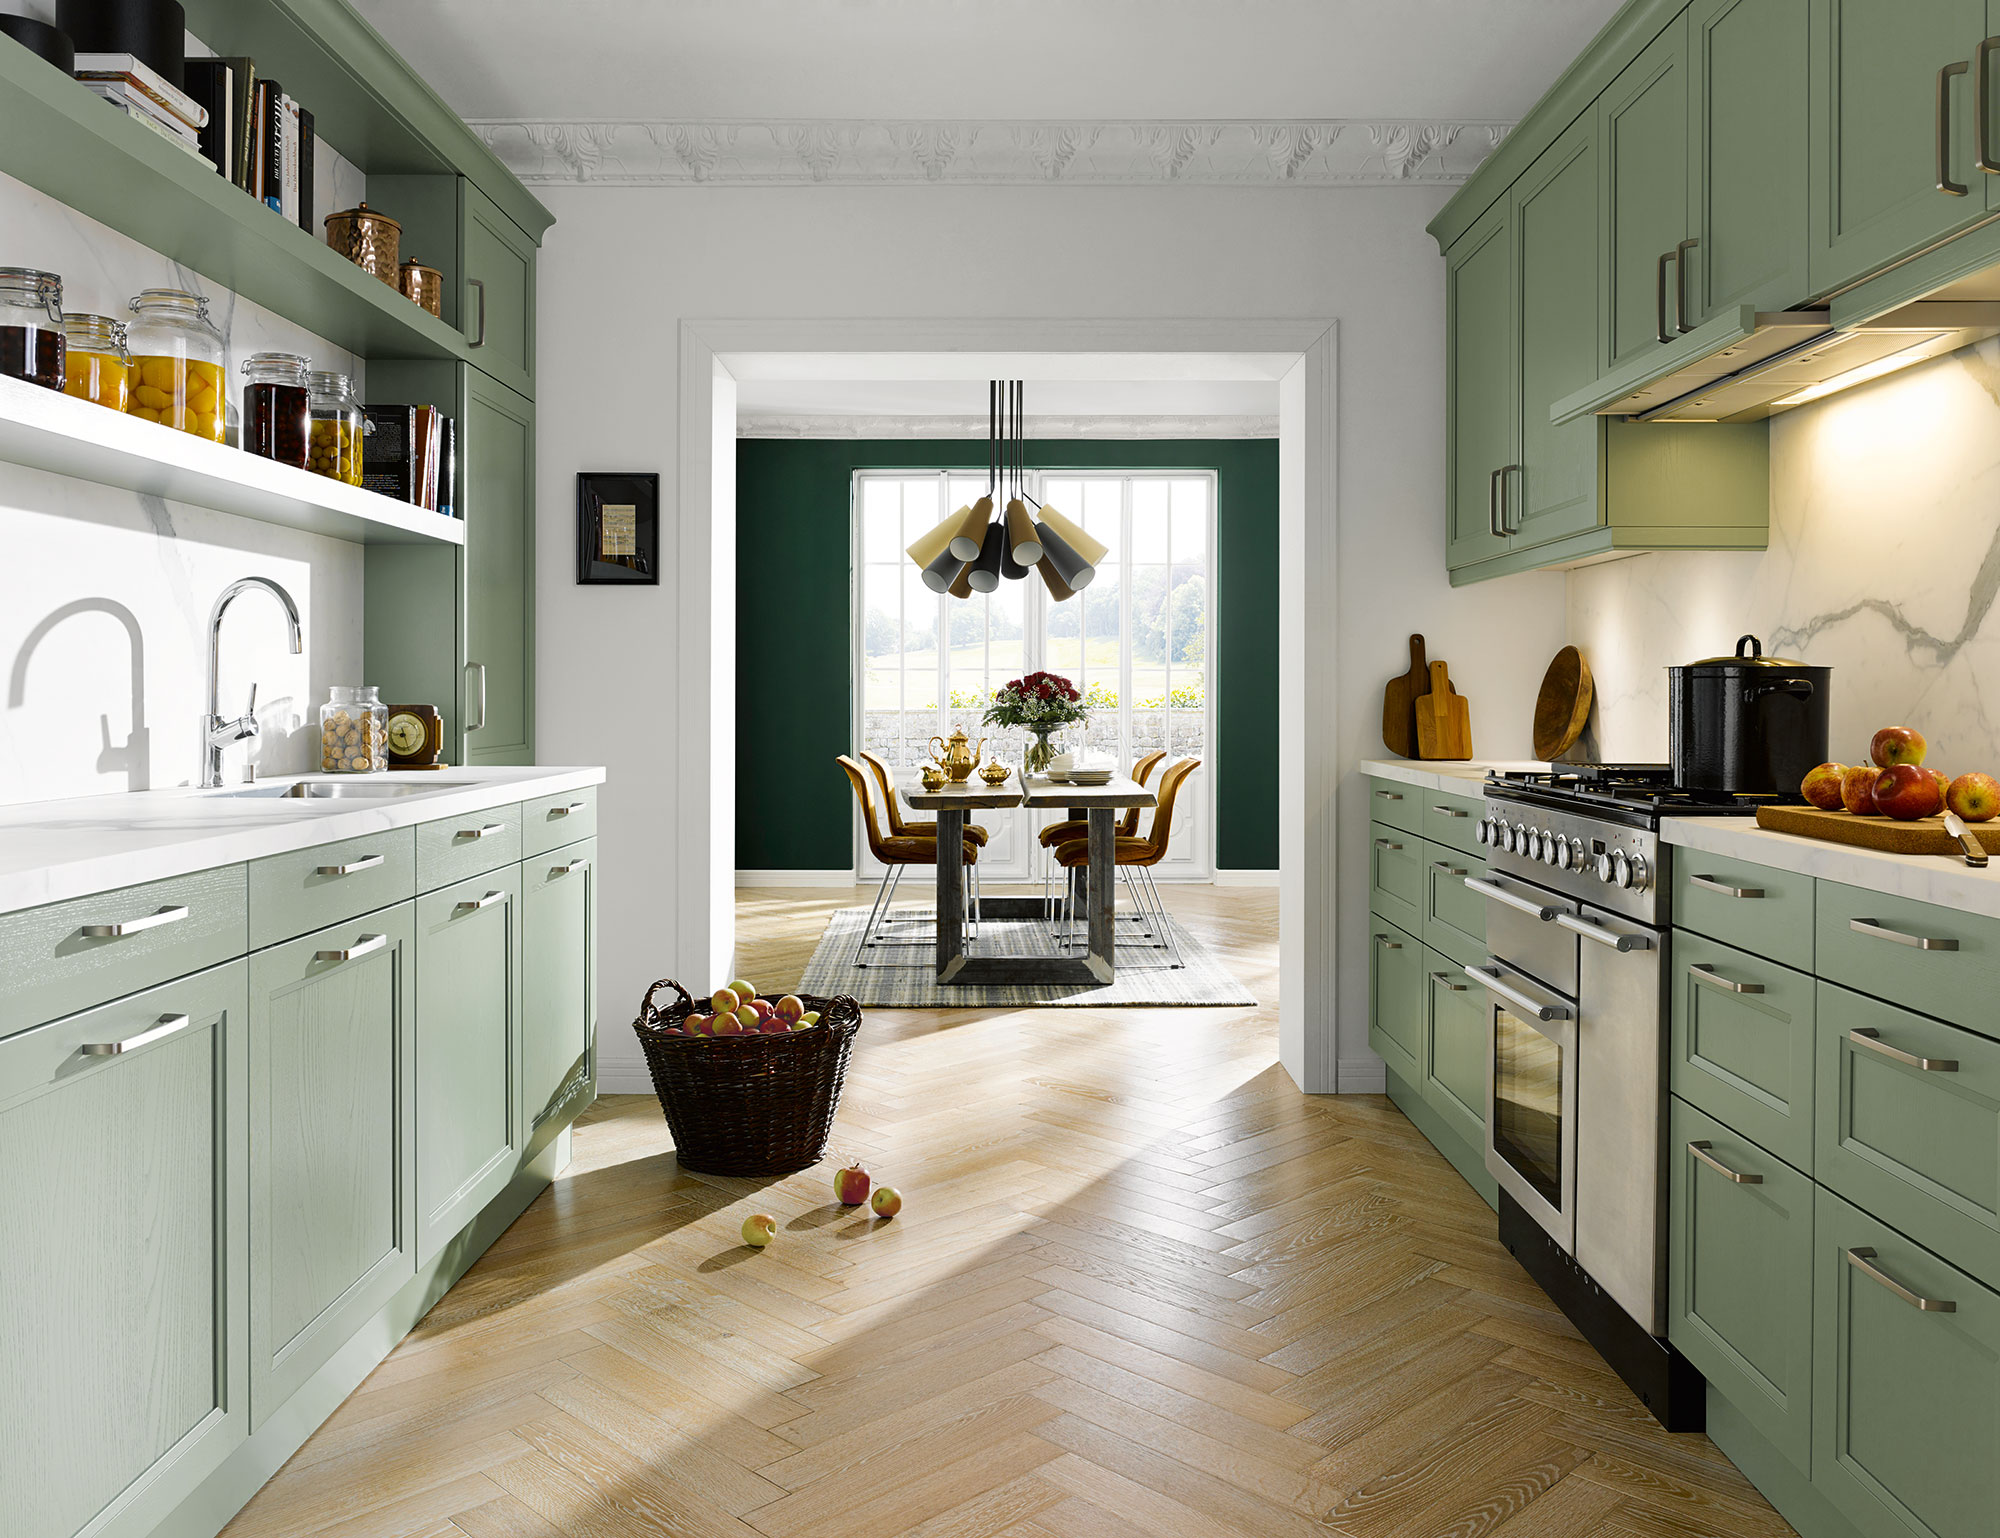 27 Shaker Kitchen Images Inspiring Shaker Kitchen Ideas Photo Gallery